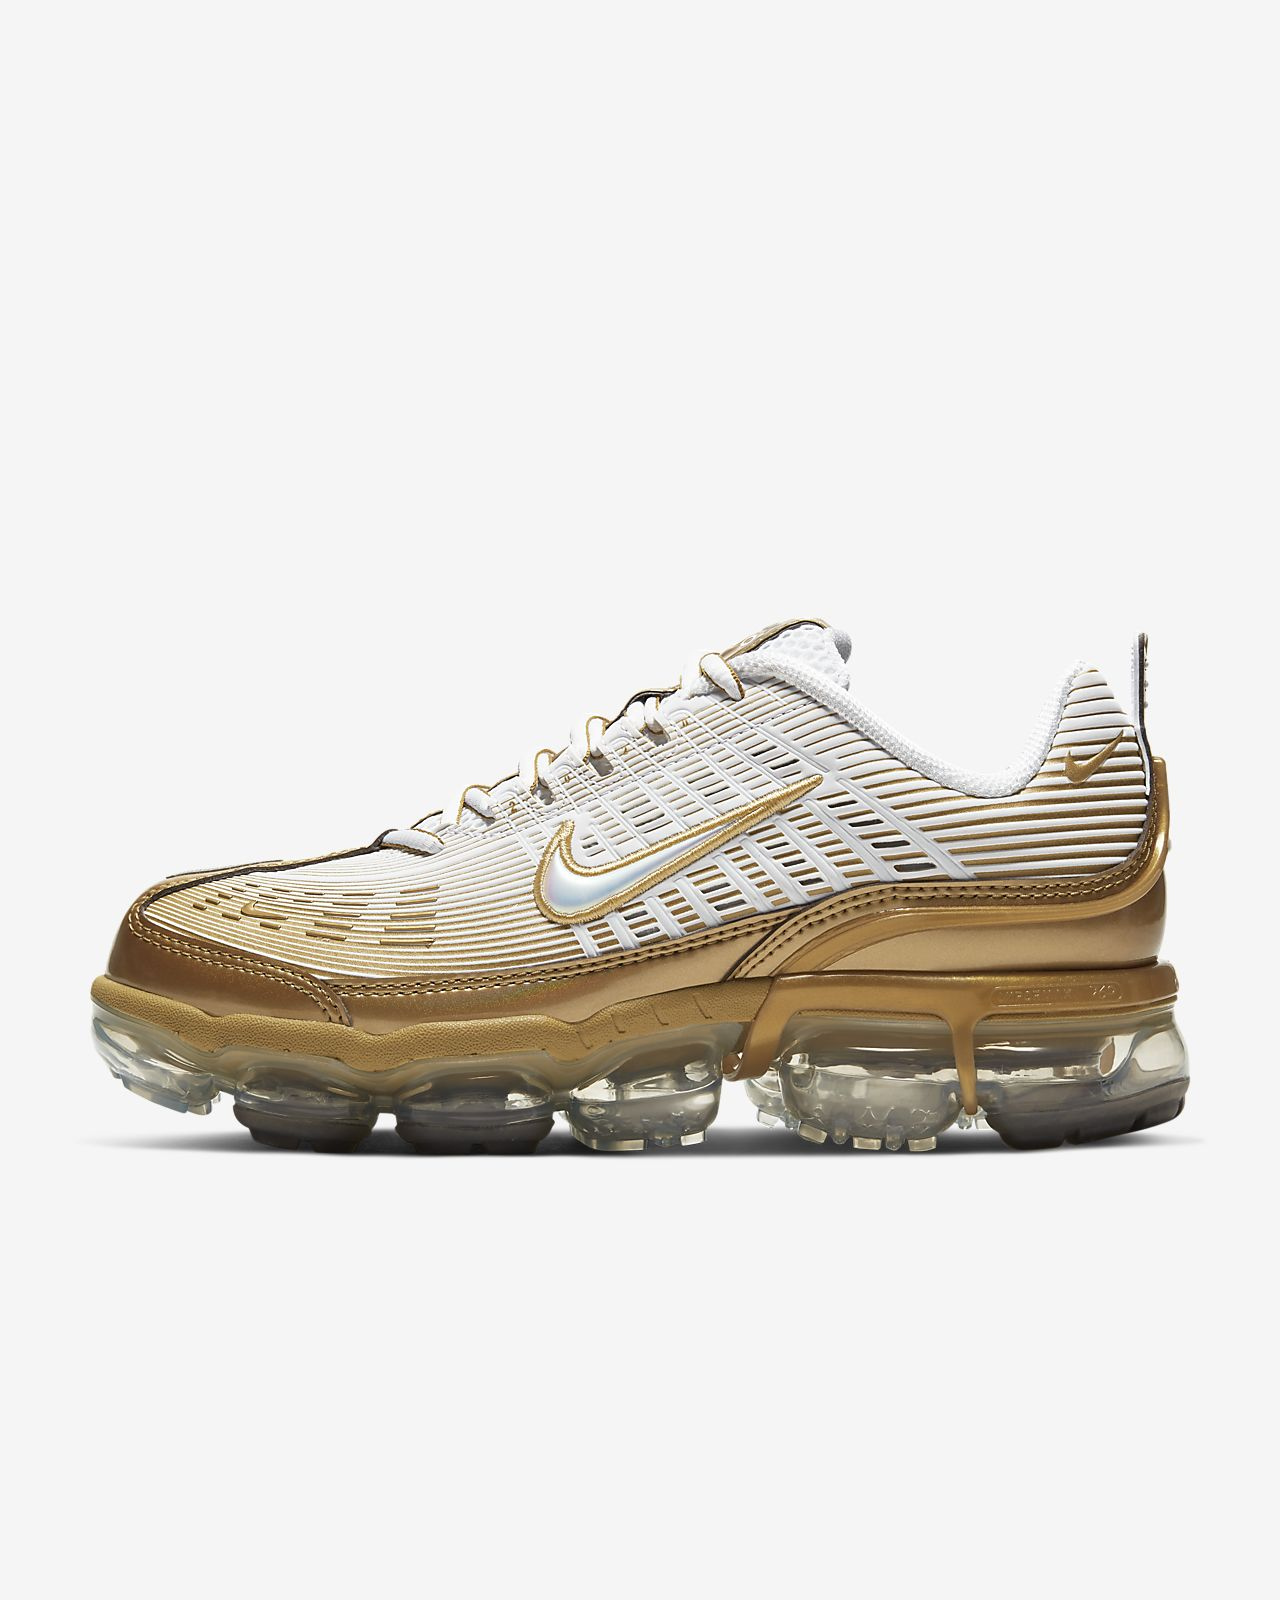 Nike Air Vapormax 360 sko til kvinder